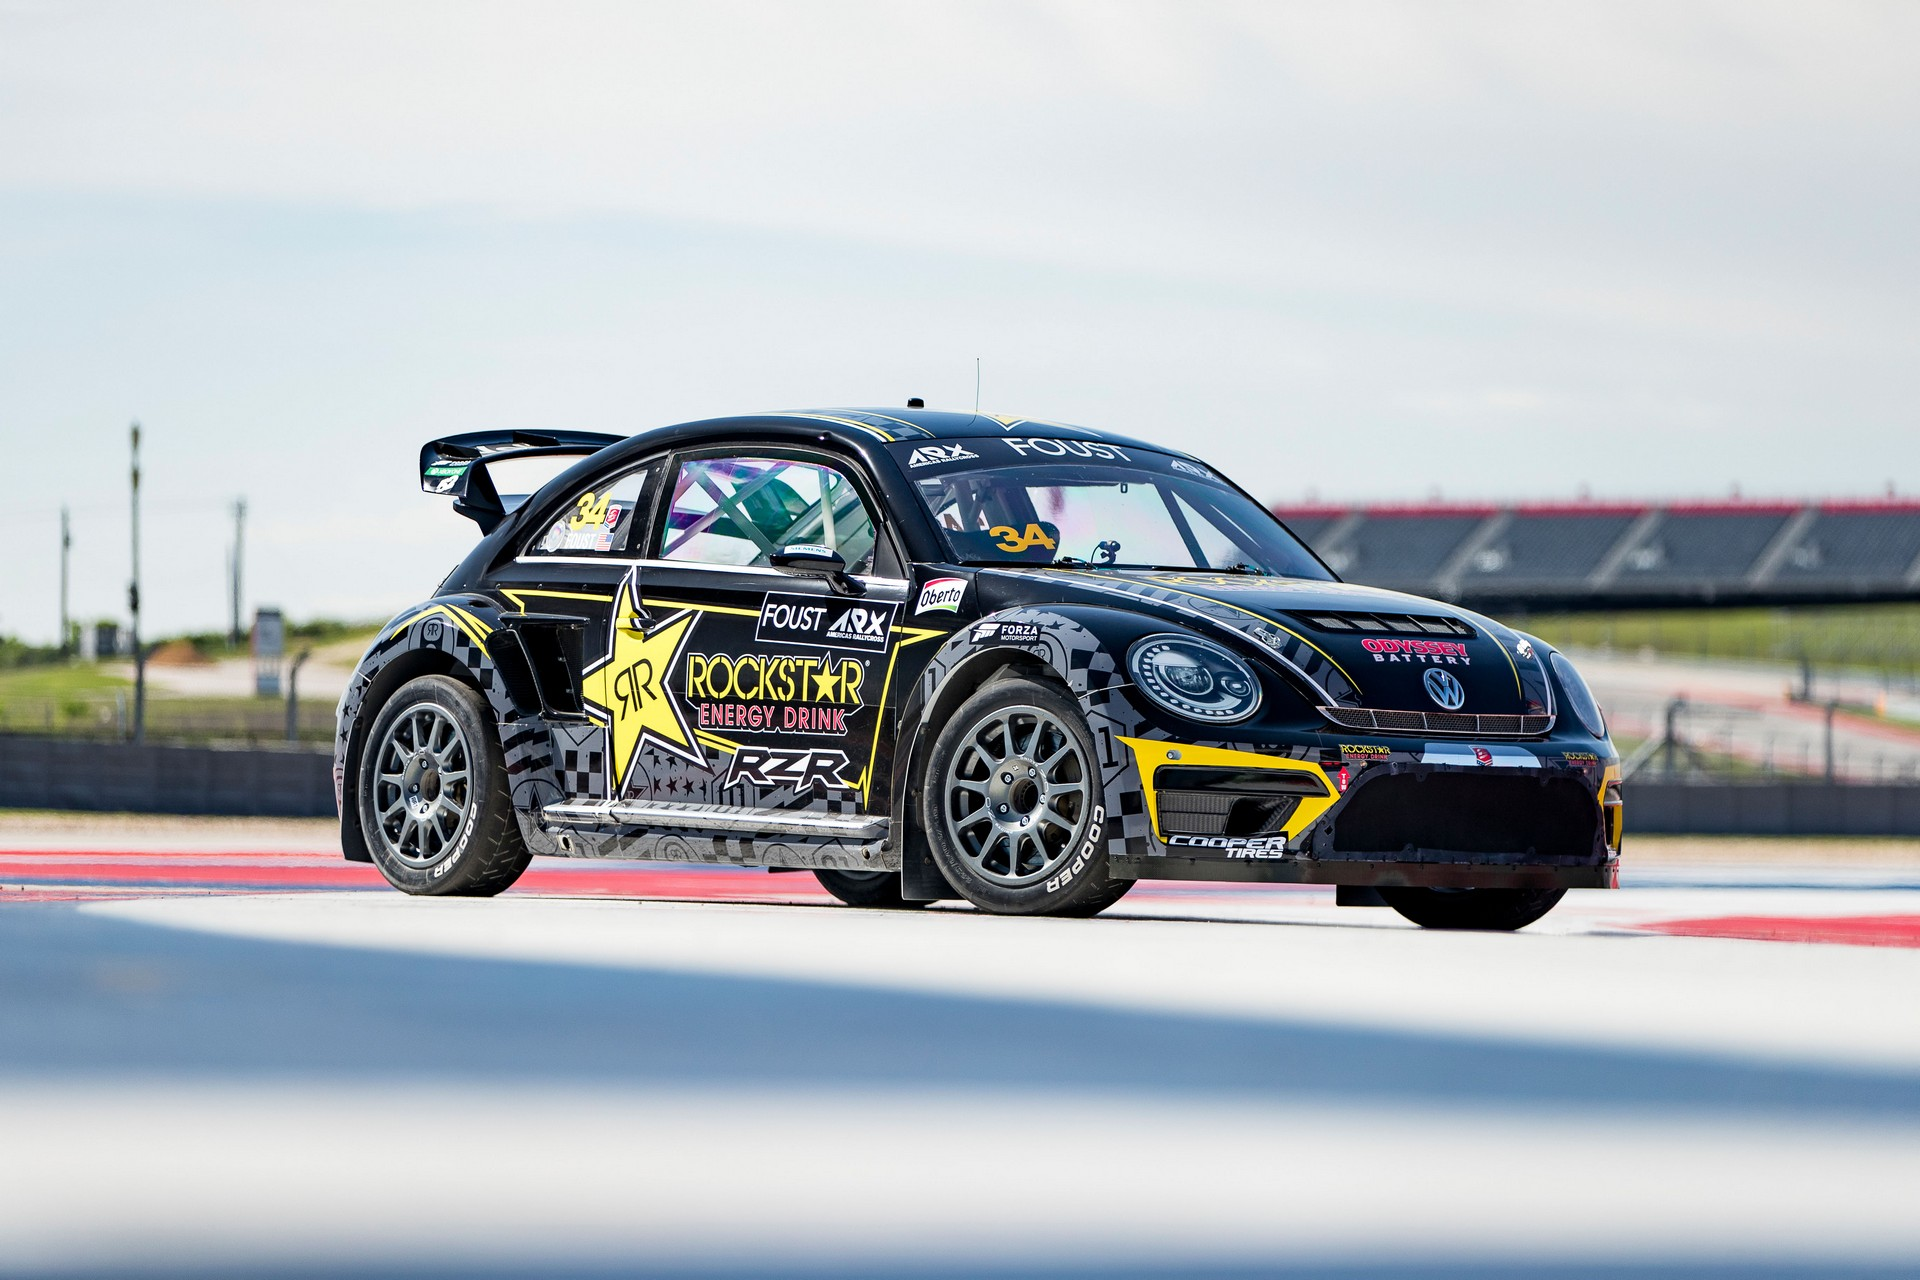 VW-GP-Ice-Race-2020-4